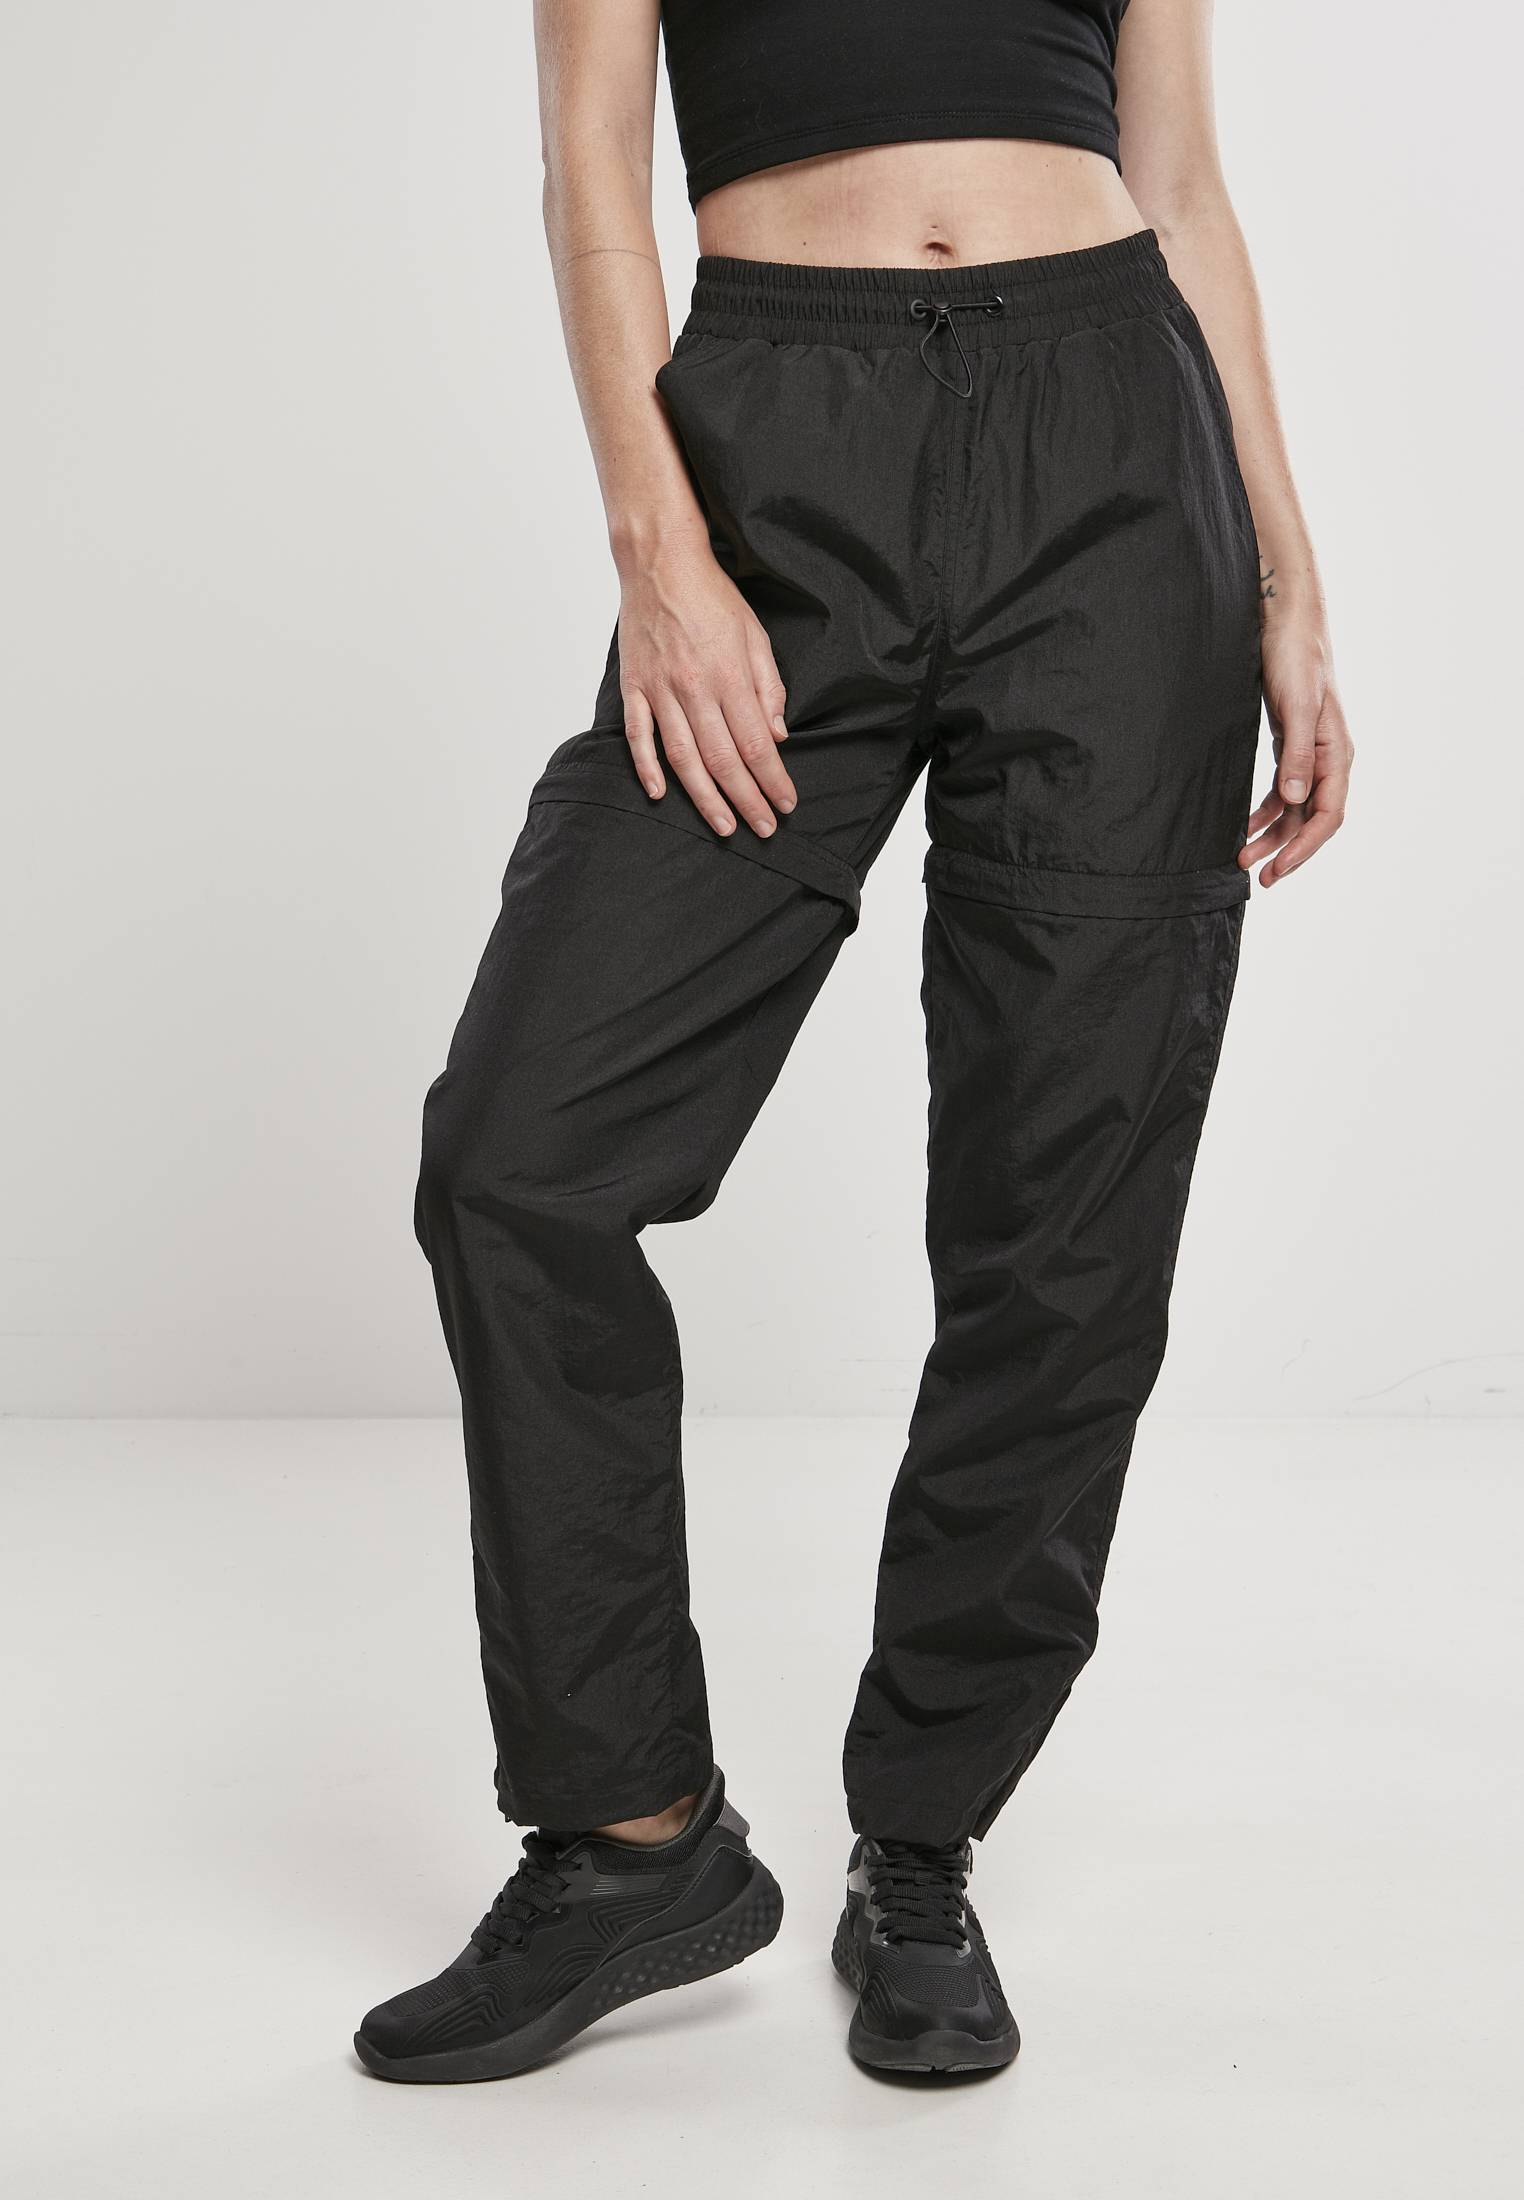 Urban Classics Ladies Shiny Crinkle Nylon Zip Pants black - 3XL